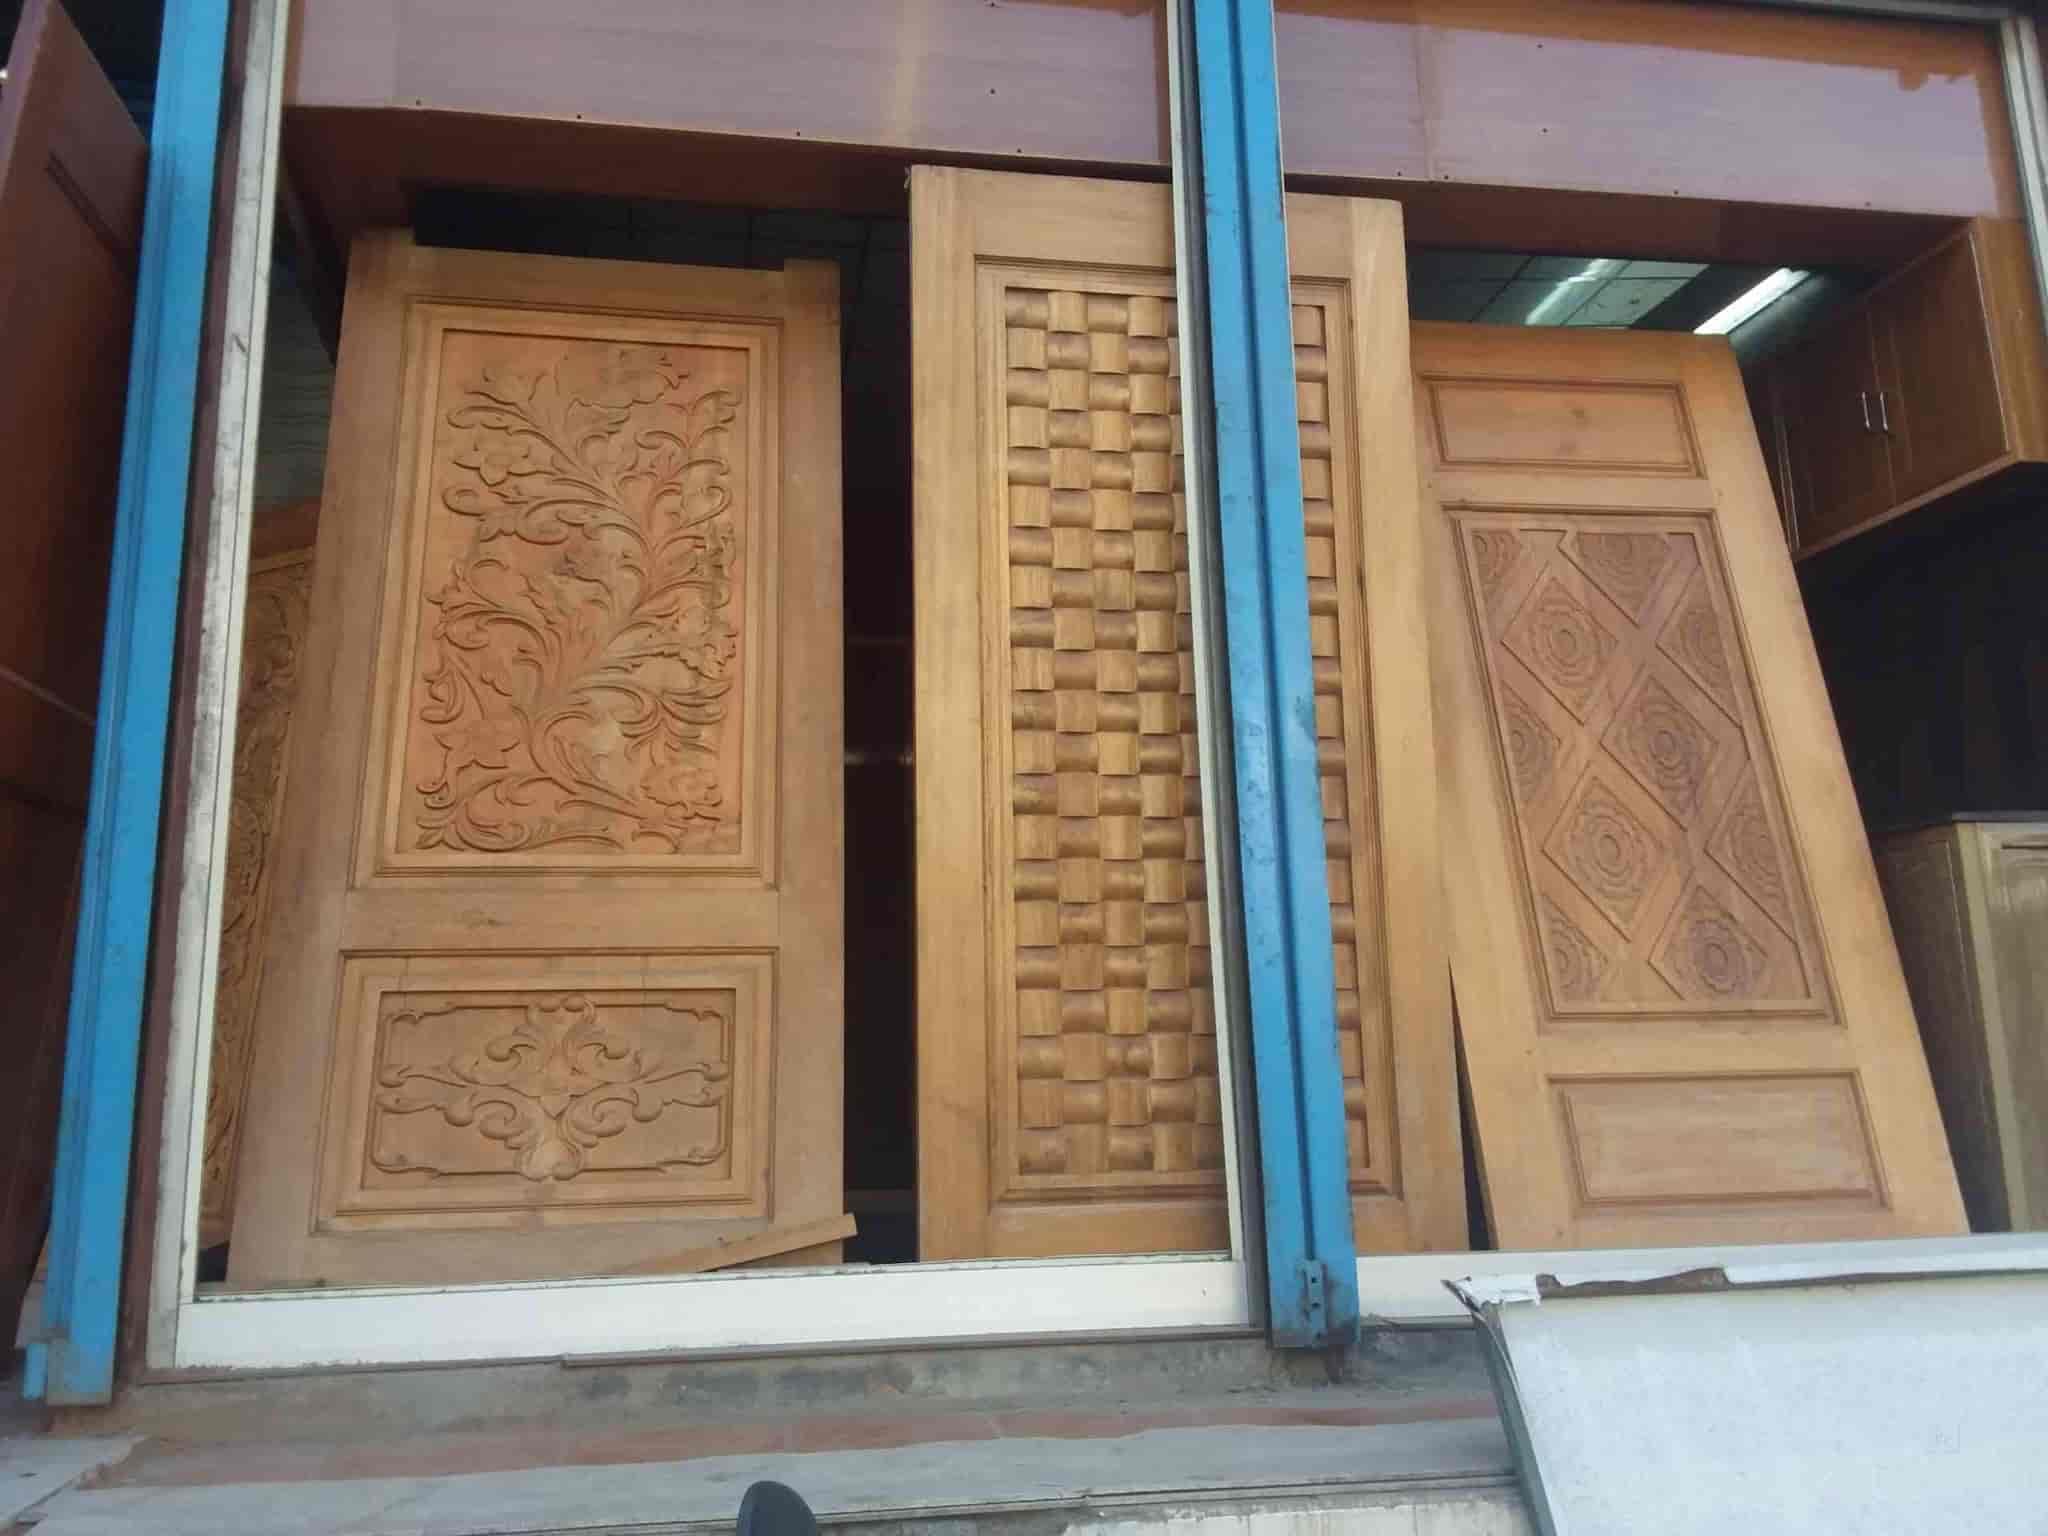 ... Door World Photos Arumbakkam Chennai - PVC Door Dealers ... & Door World Photos Arumbakkam Chennai- Pictures \u0026 Images Gallery ...